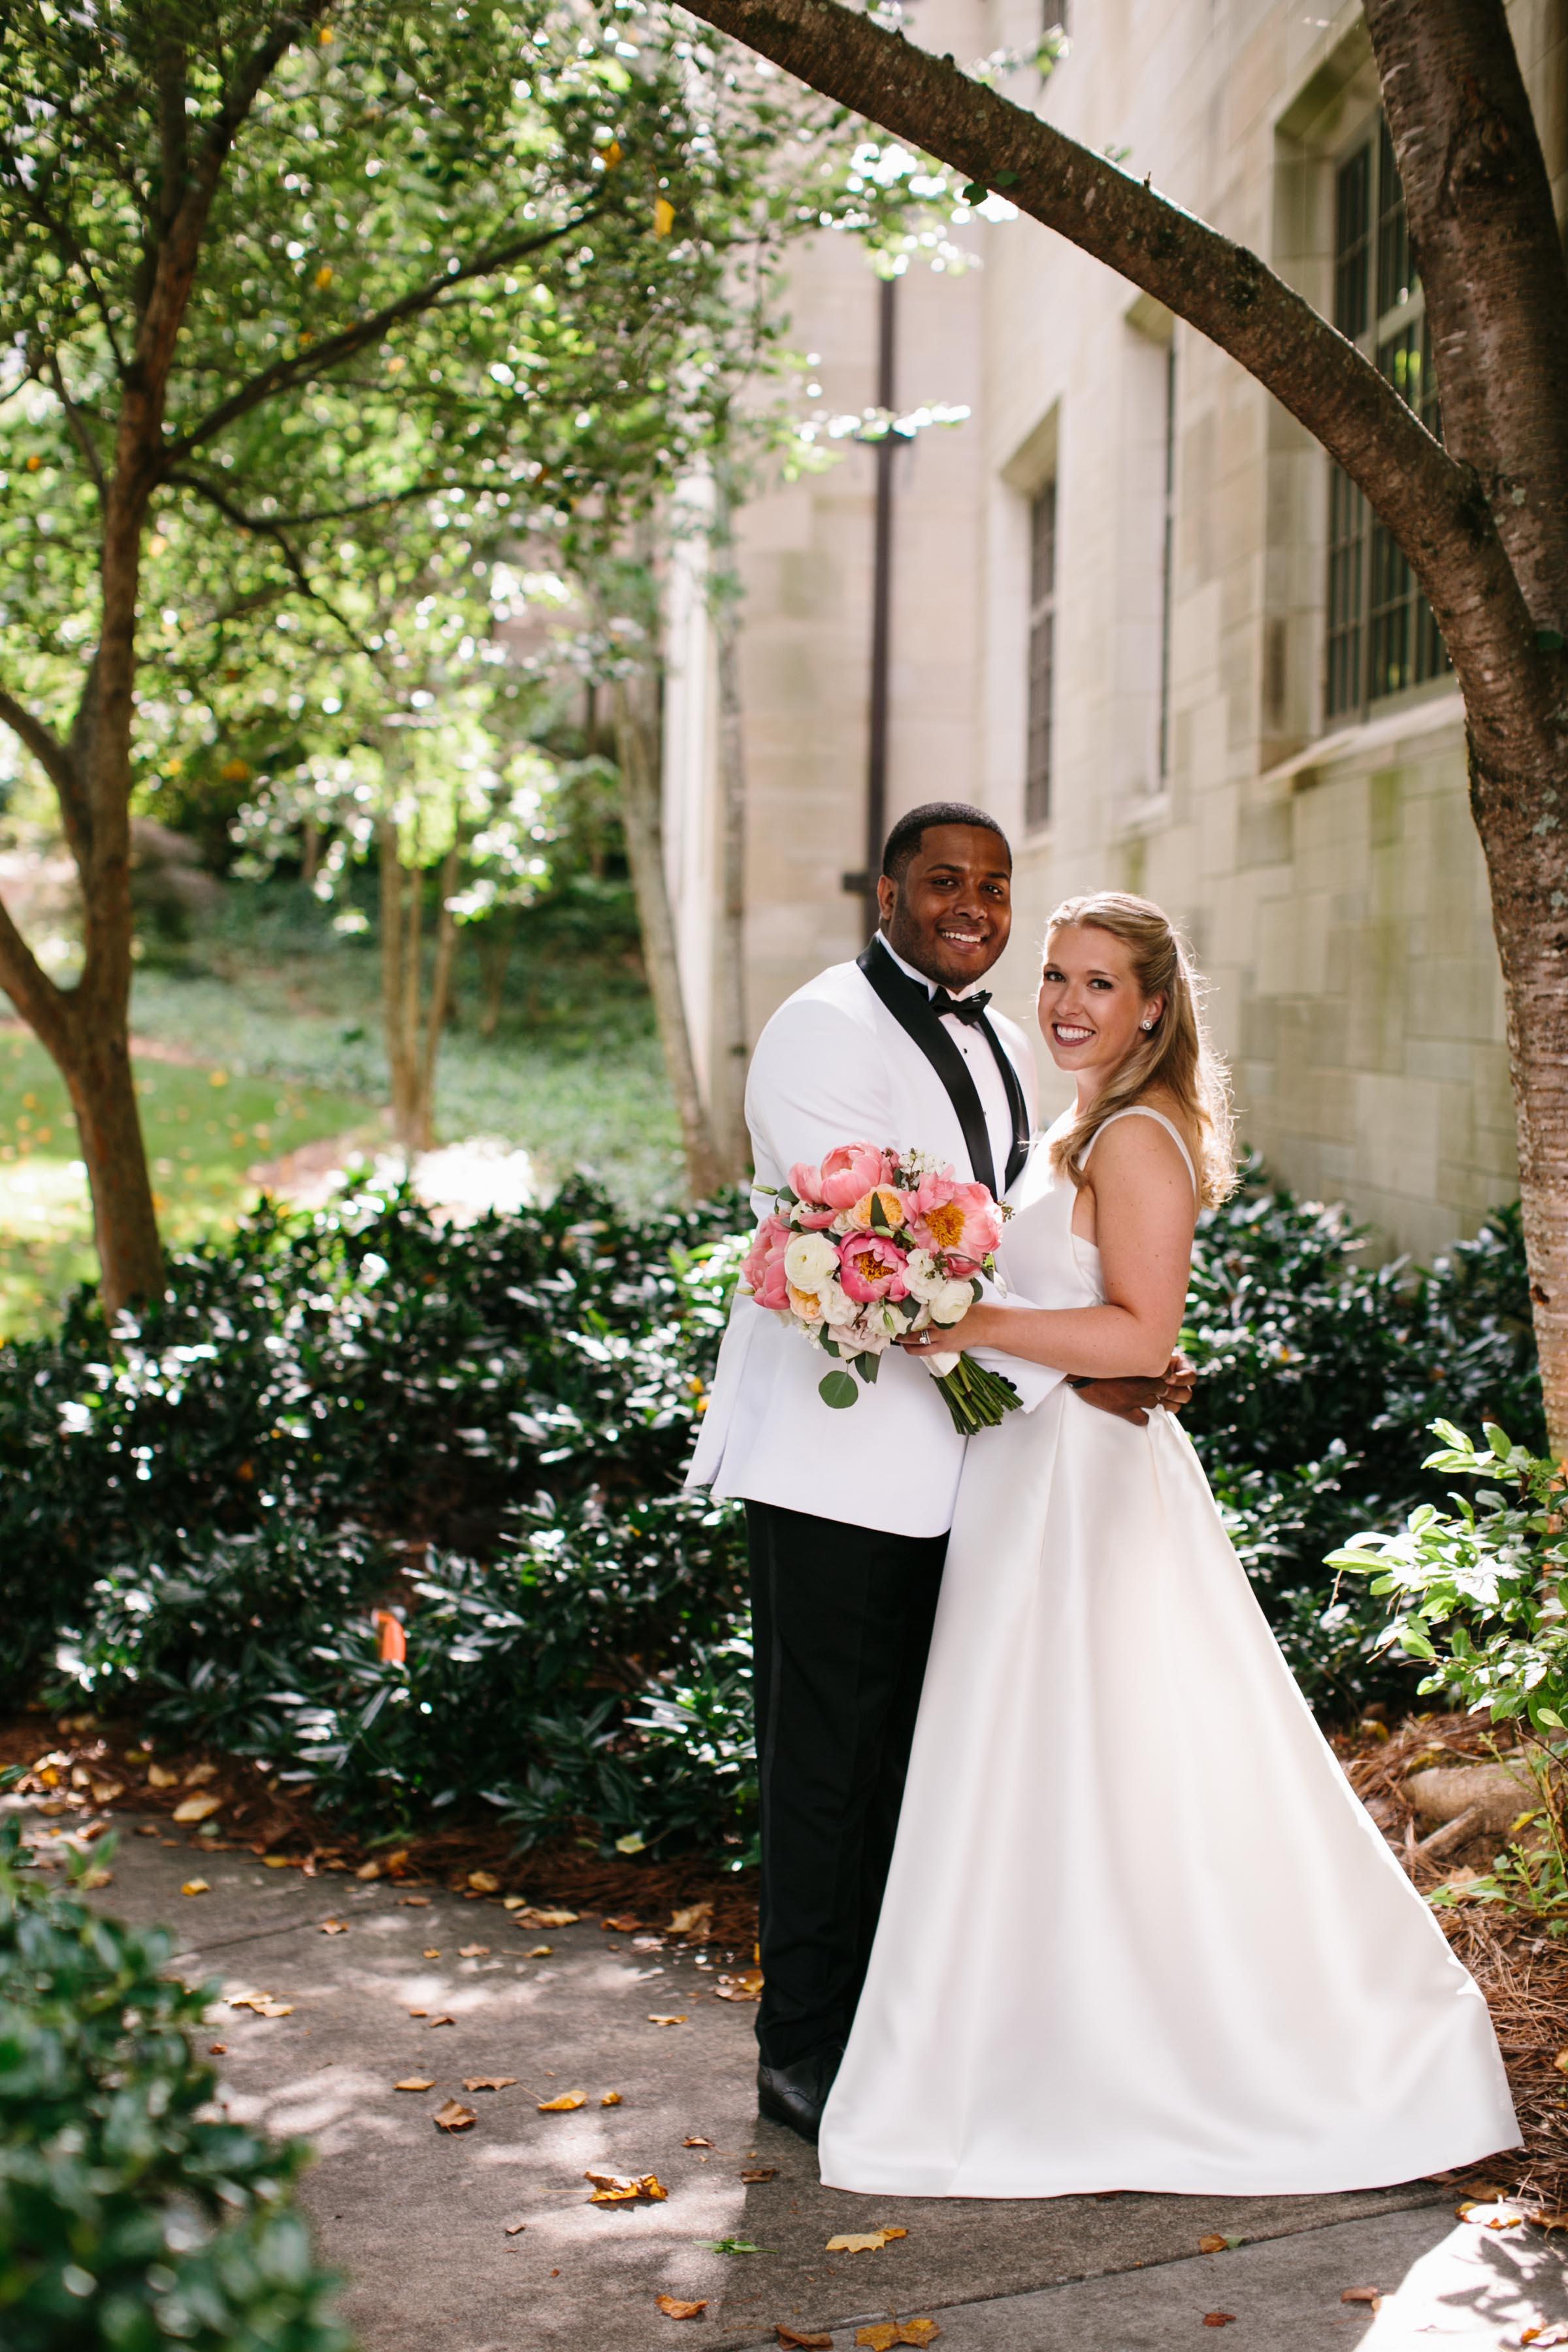 Reynolds Plantation Wedding at Sandy Creek Barn - OneNine ...